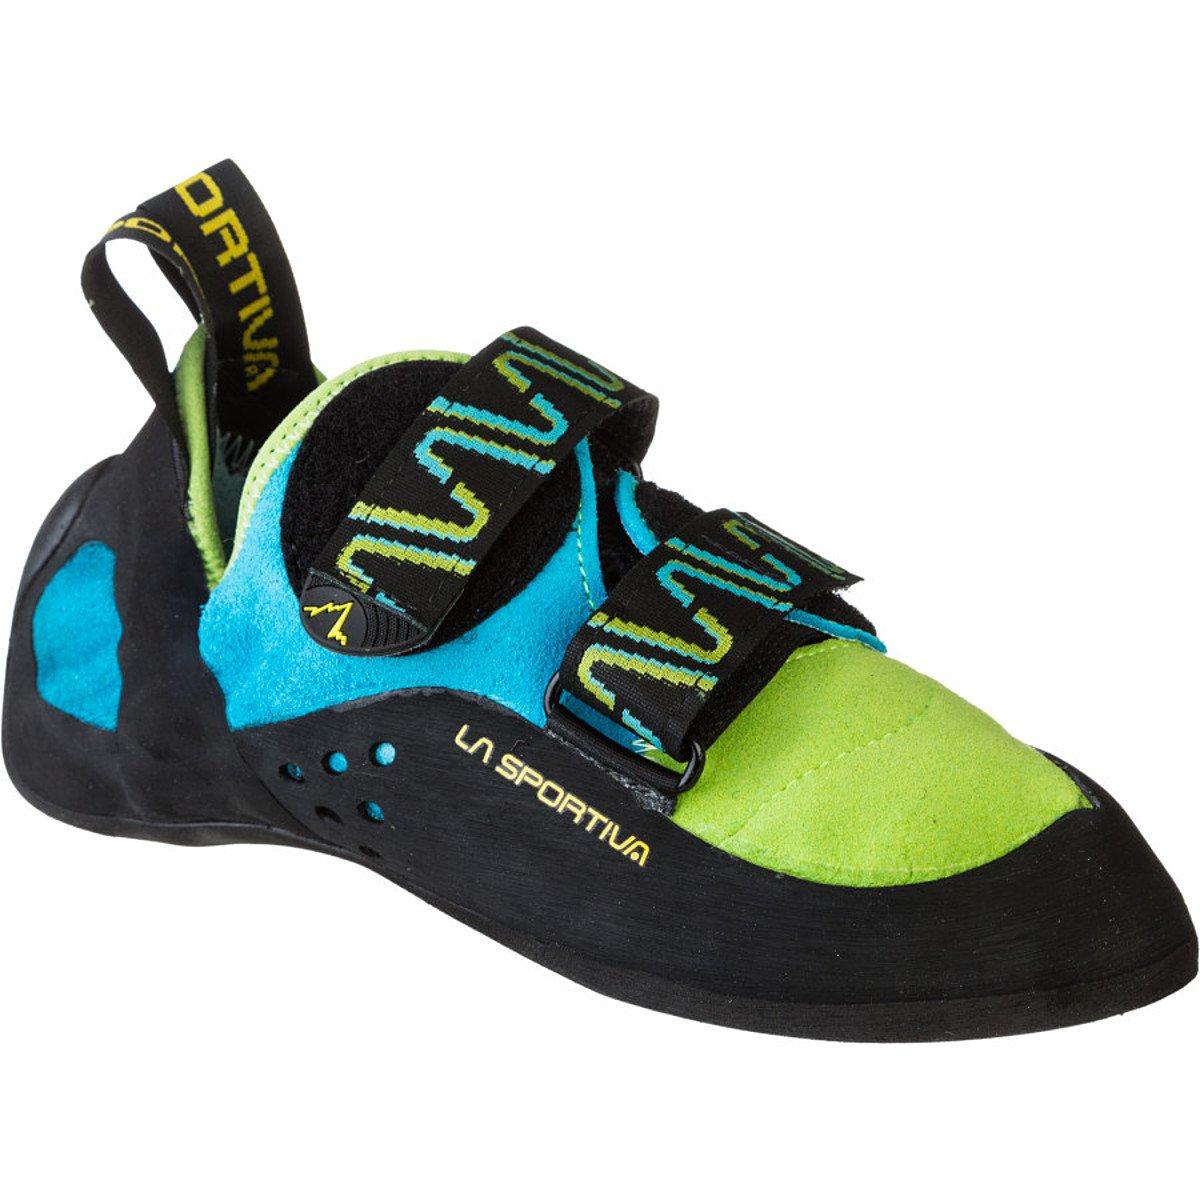 La Sportiva Men's Katana Climbing Shoe